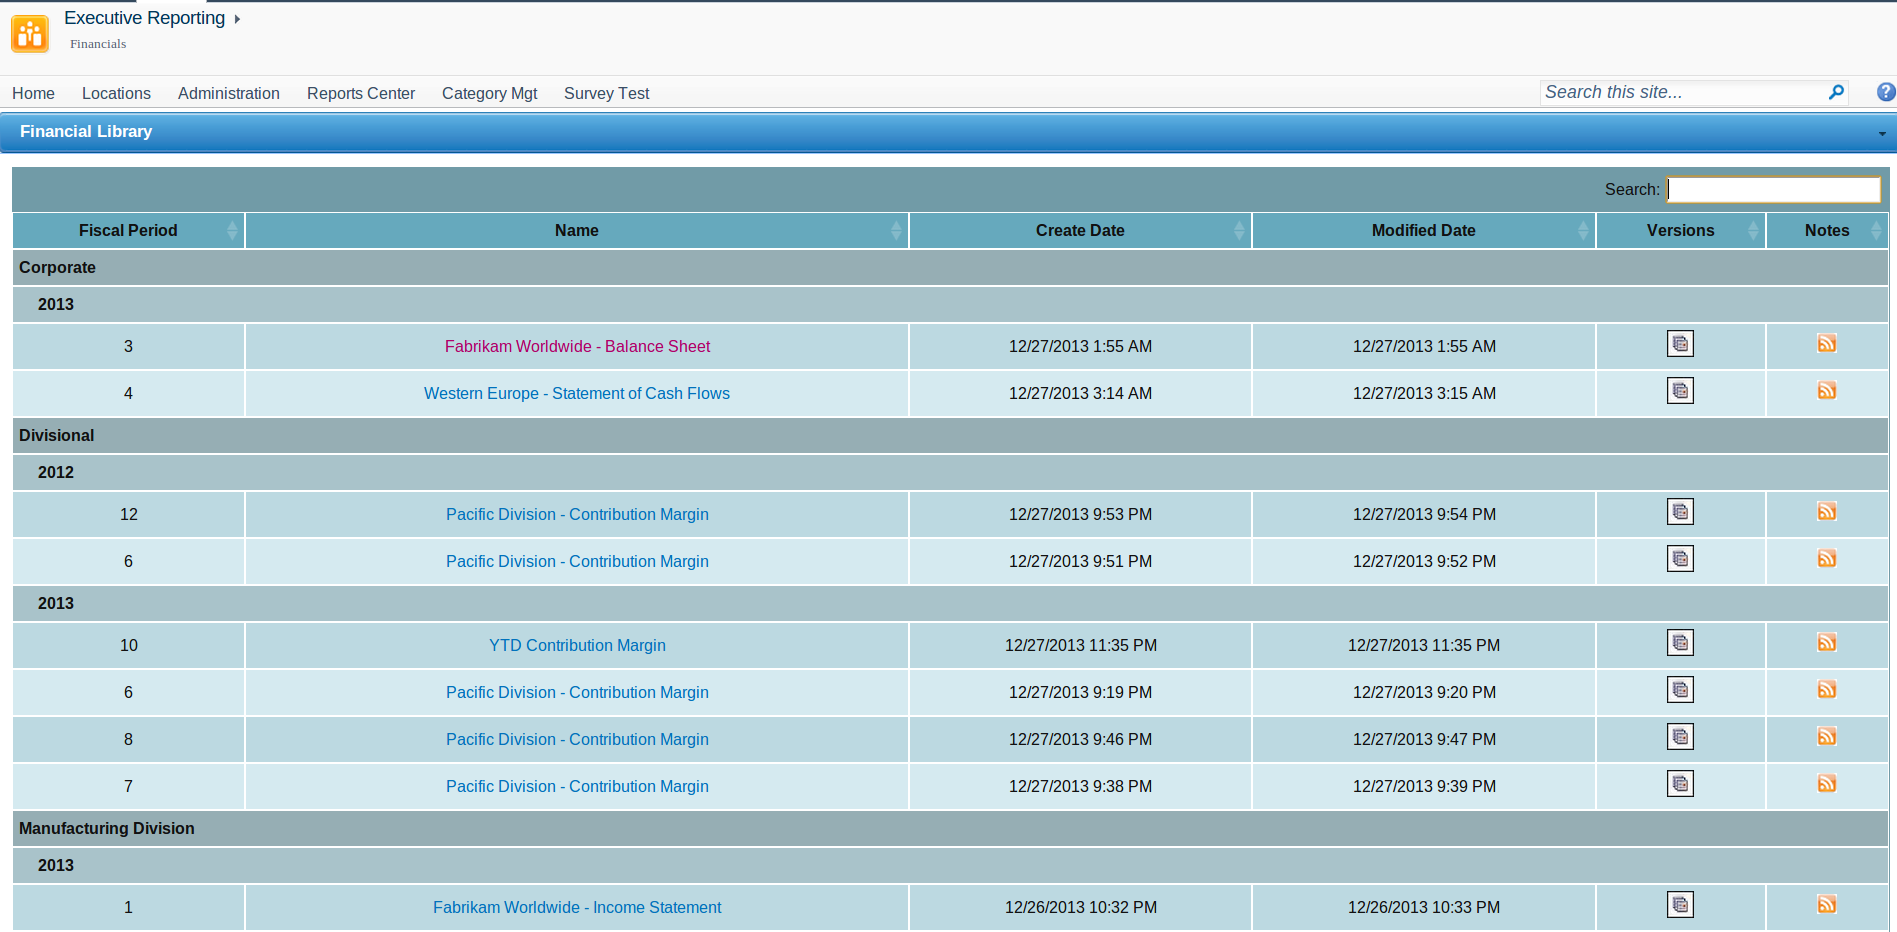 SPS_FL 2013-12-30 20:01:09.png